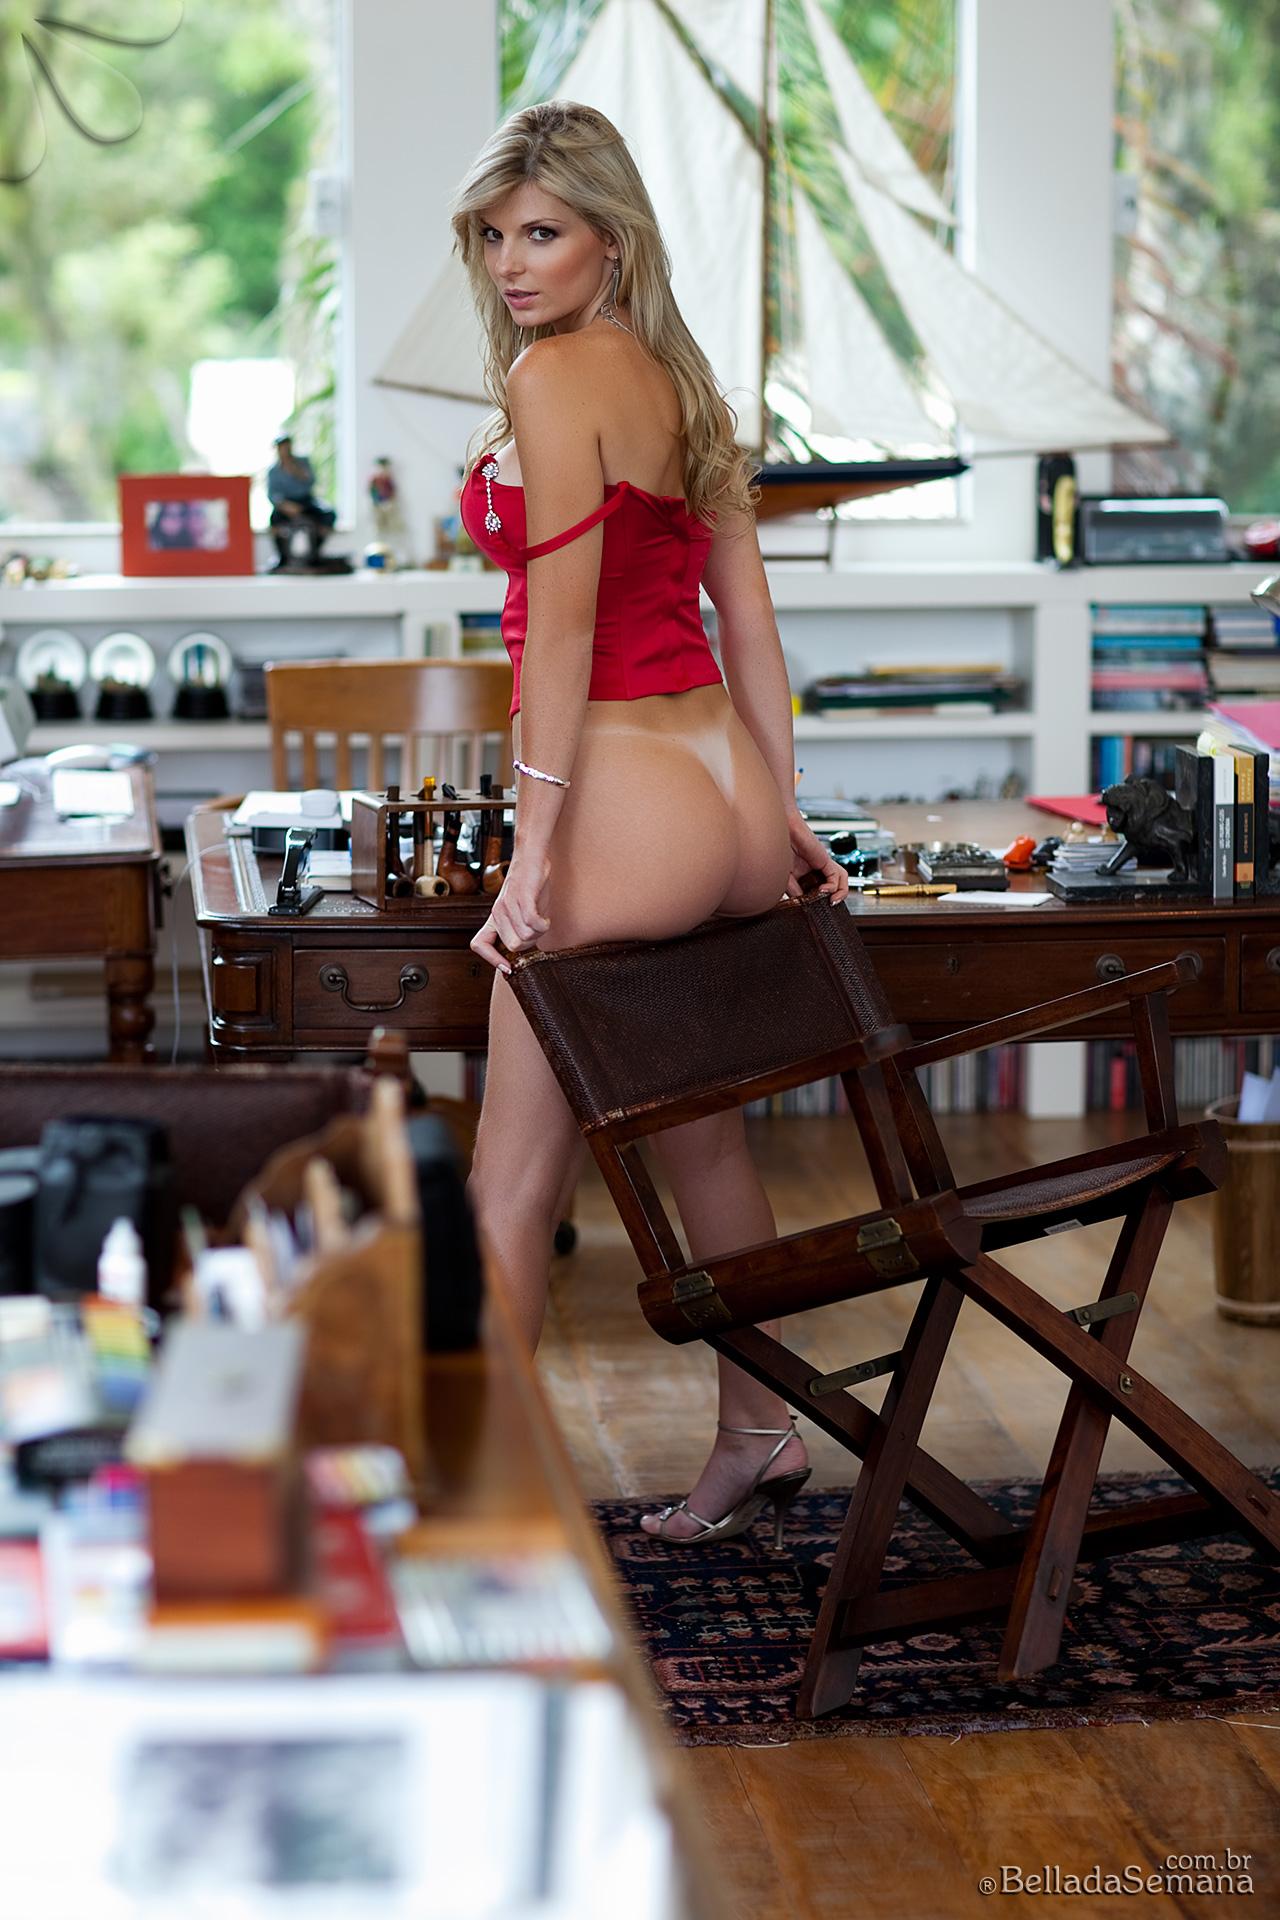 angelica-woicichoski-tan-lines-blonde-brazilian-bella-da-semana-10